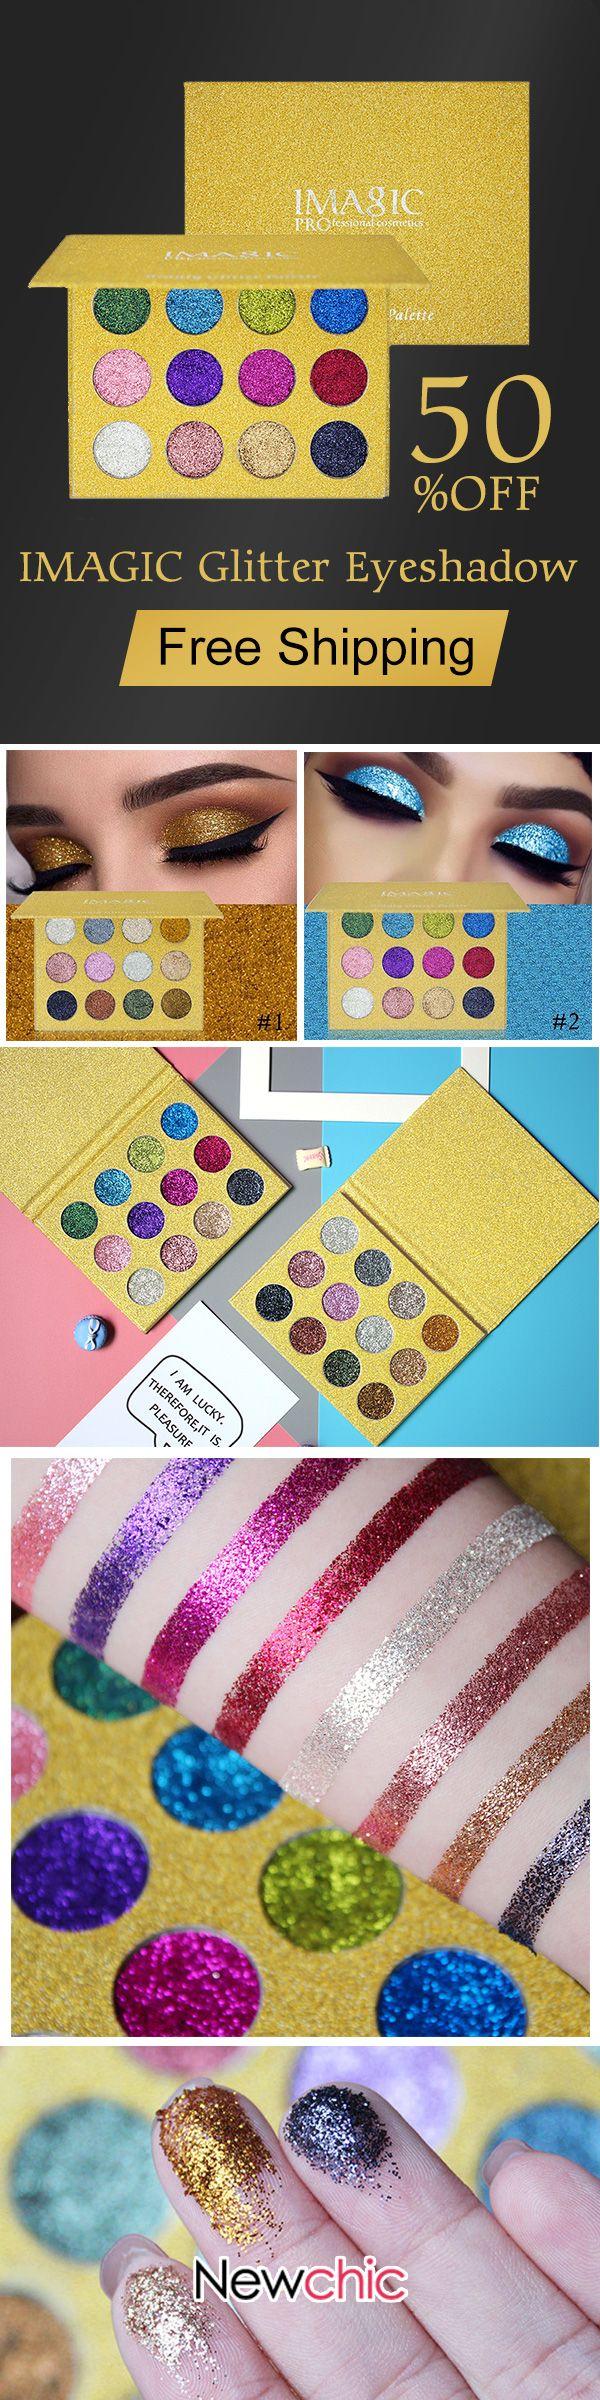 IMAGIC Glitter Eyeshadow Palette Diamond Rainbow